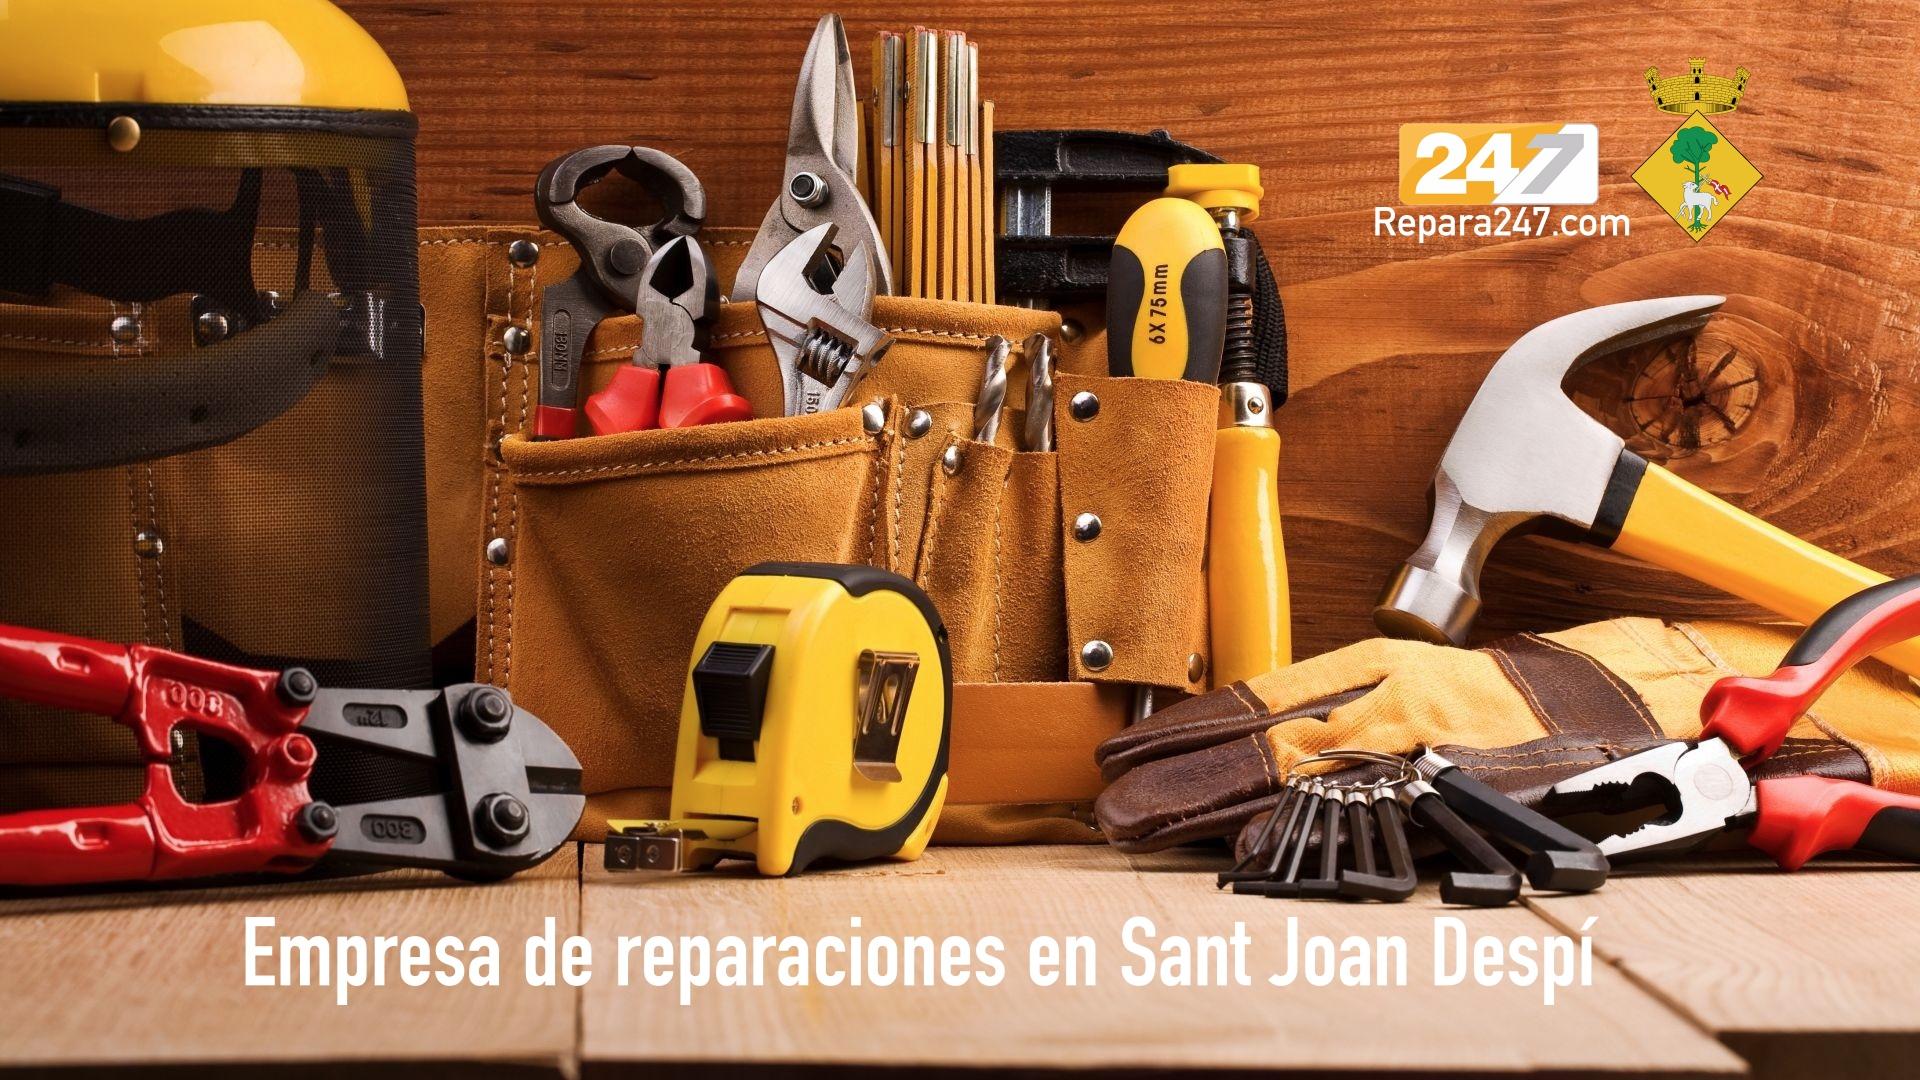 Empresa de reparaciones en Sant Joan Despí